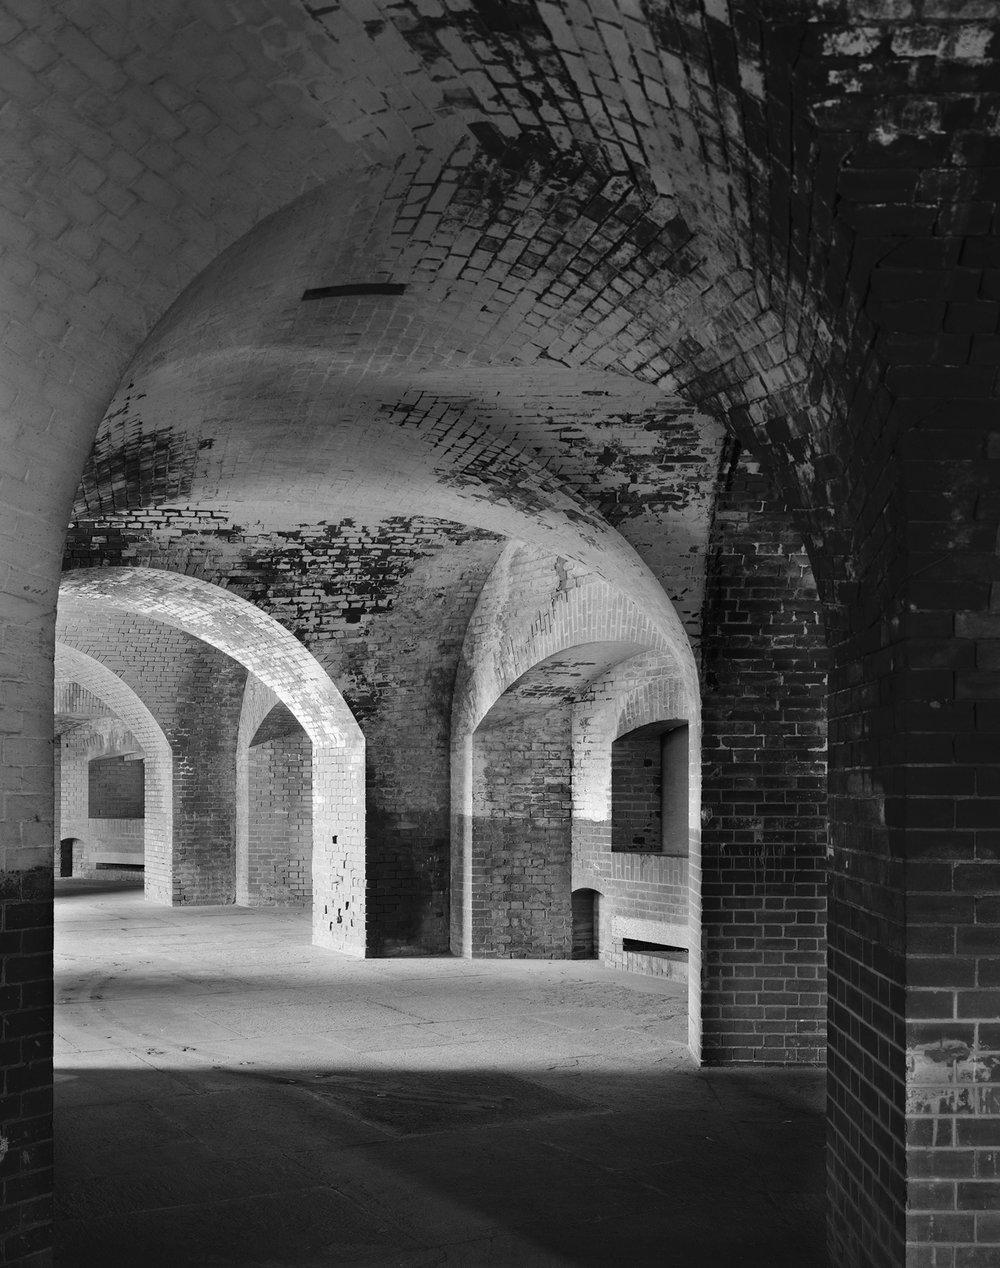 161011 3rd Fl Arches f32*9 min N-1 8x6 Print File (2).jpg